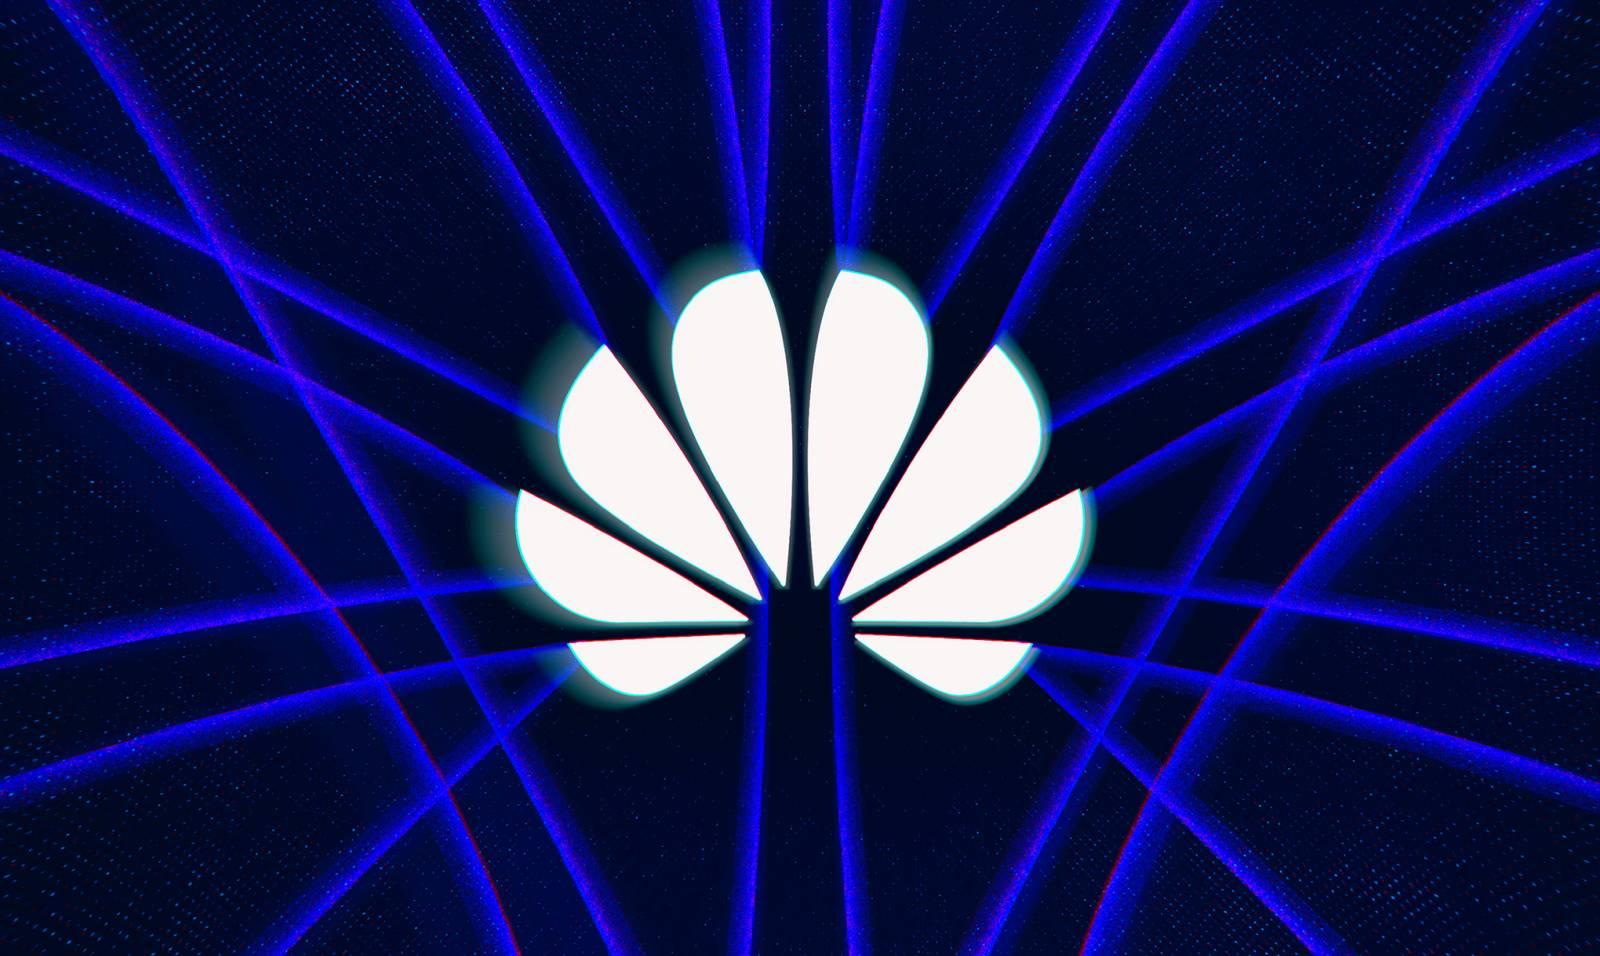 Huawei. Noua LOVITURA GREA, Ce e OBLIGATA sa faca cu Produsele